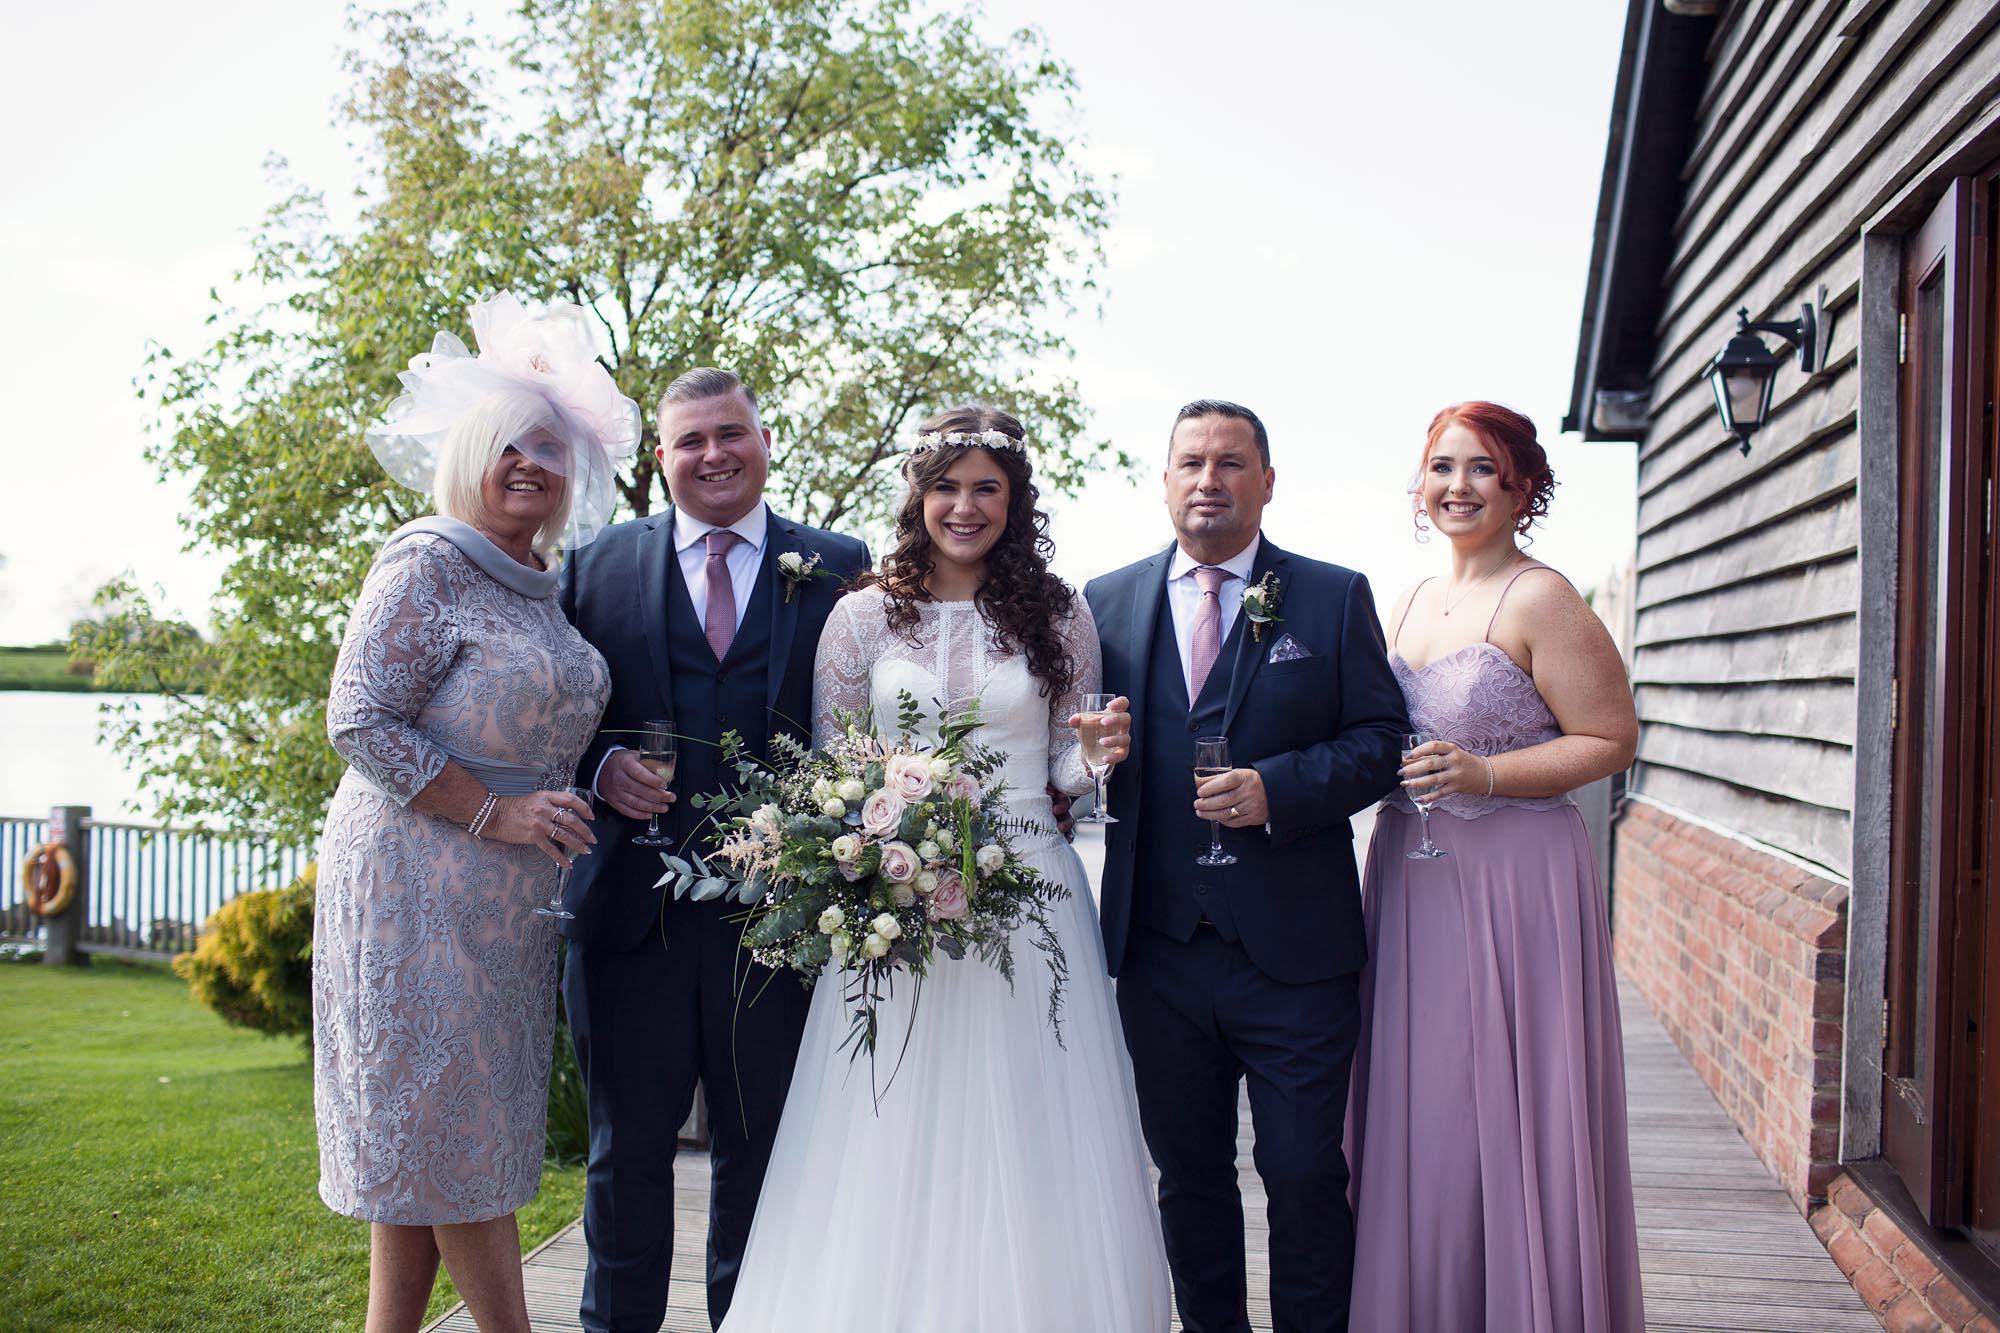 Wedding photography classic family photographer bride smiling